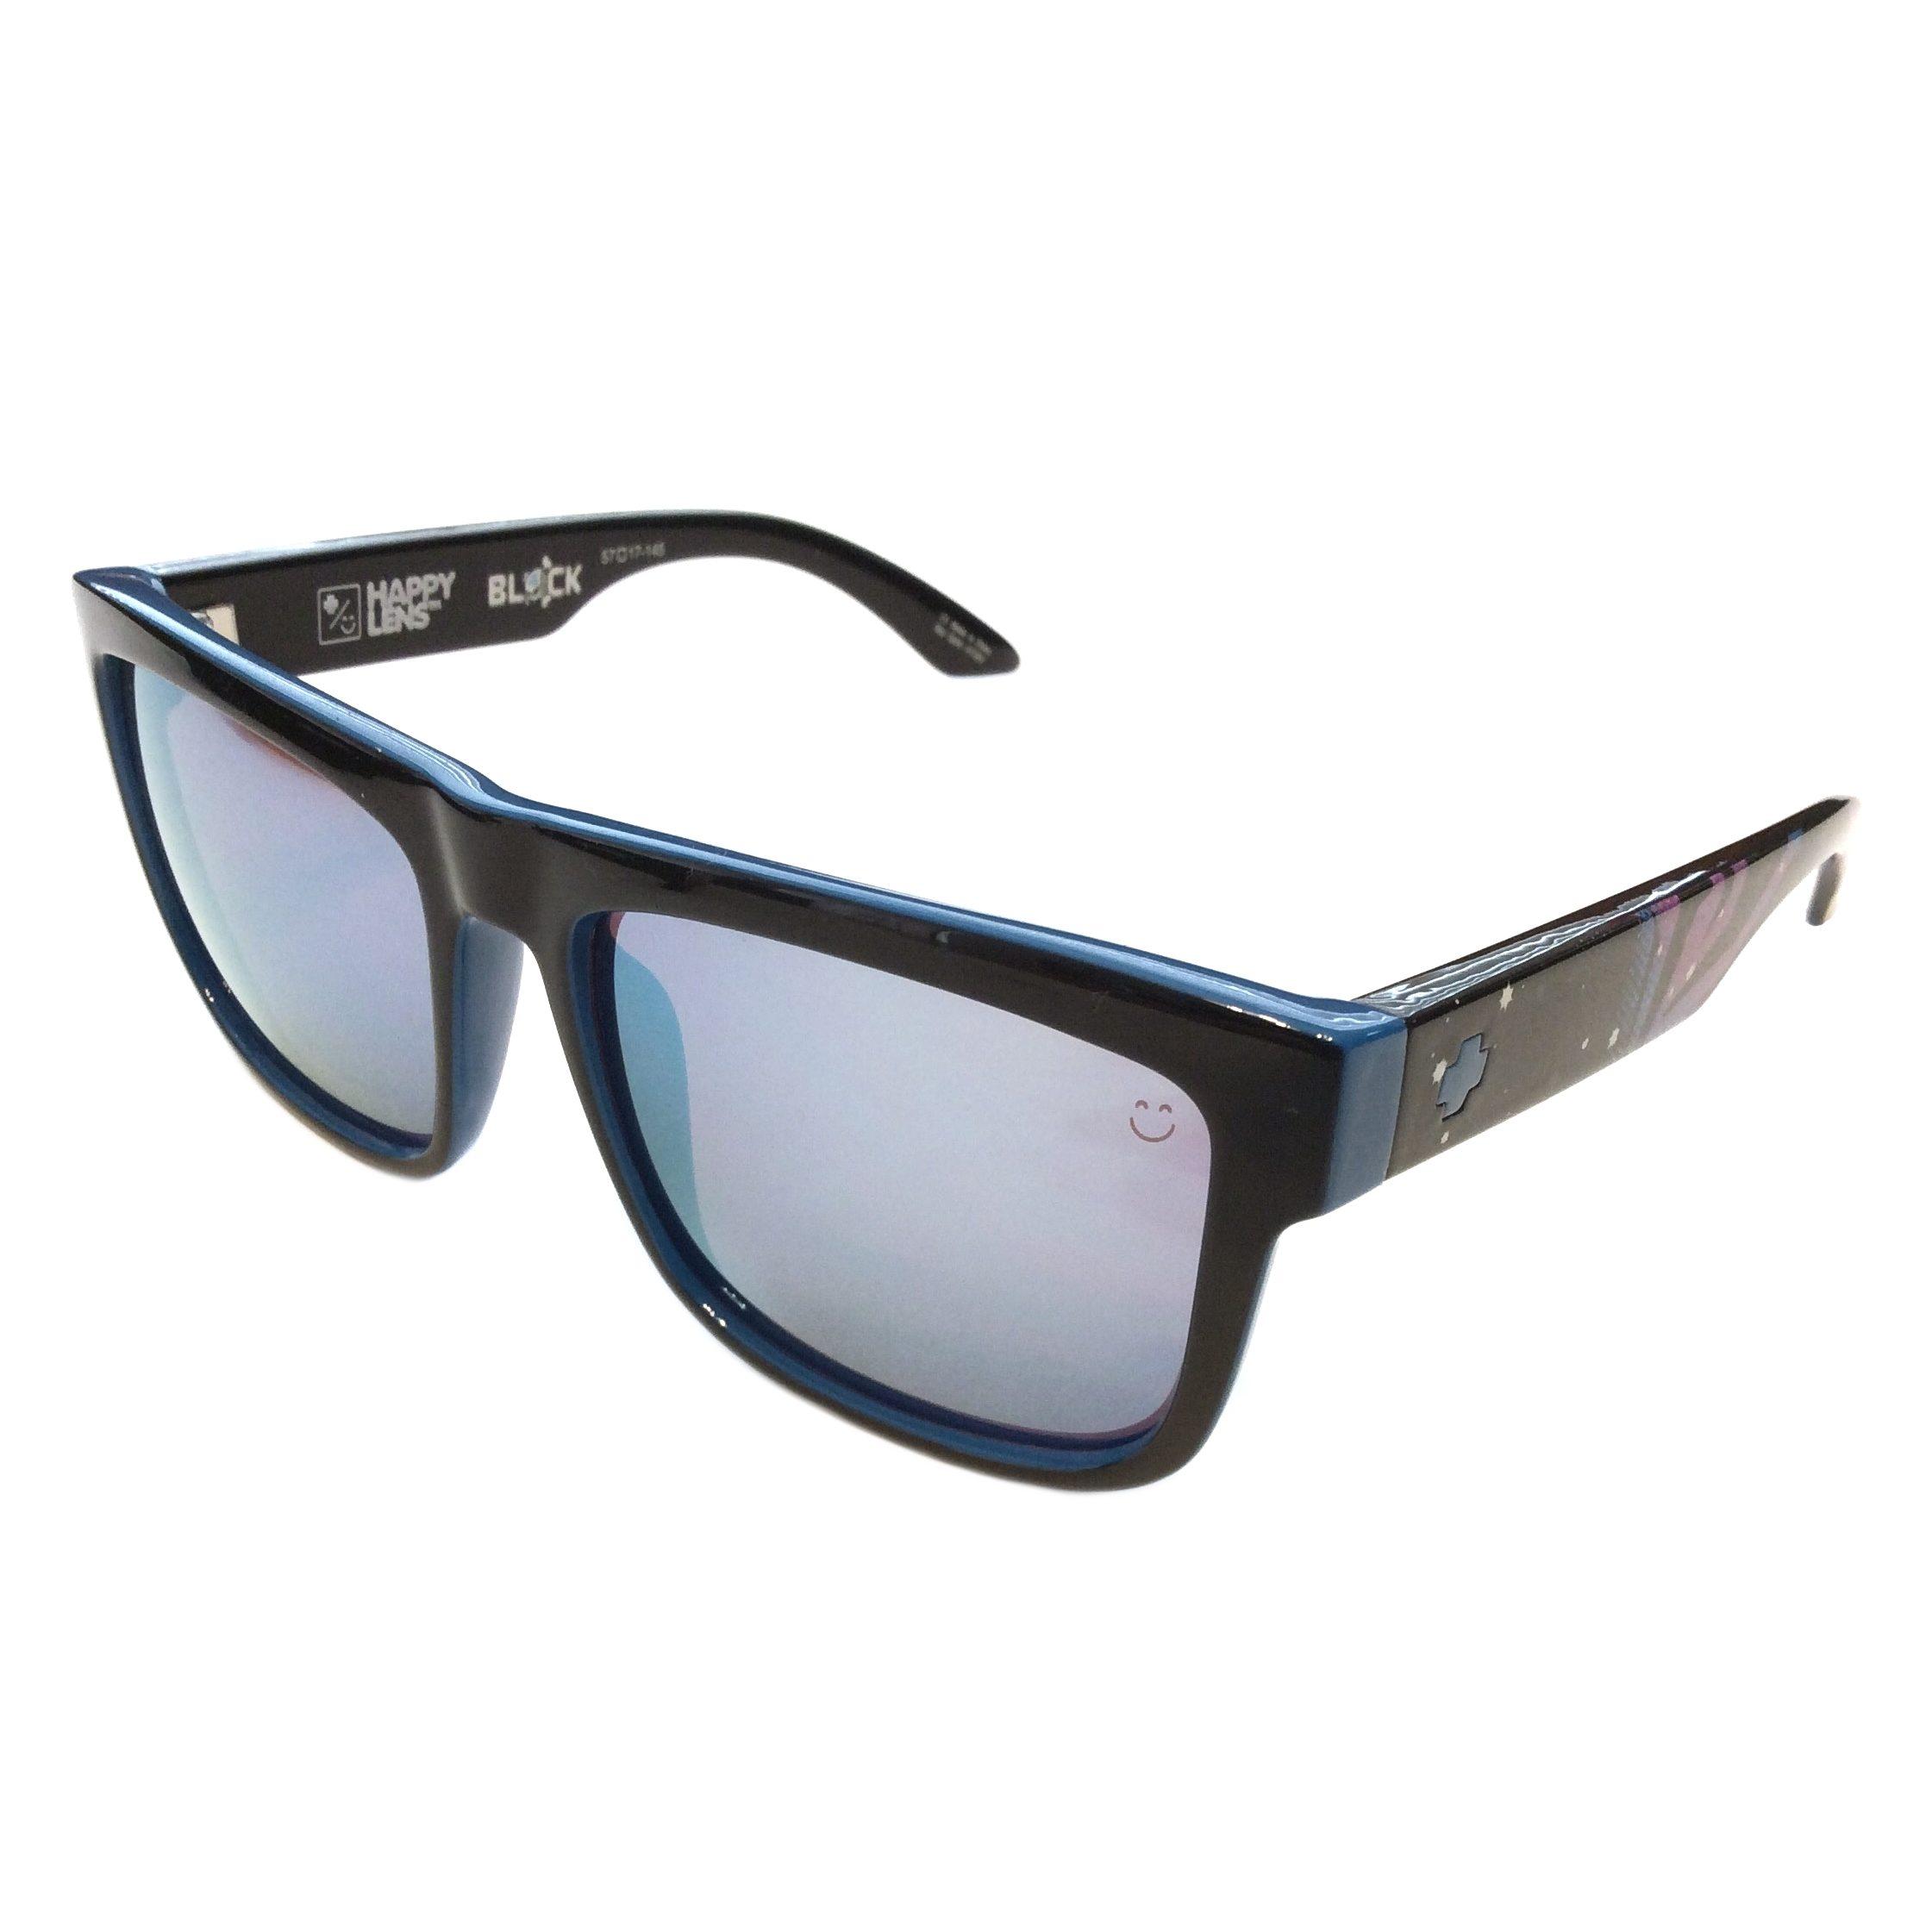 df20bc7de01 Spy Discord Sunglasses – Livery Ken Block Black   Blue Frame – Happy Bronze  Light Blue Lens